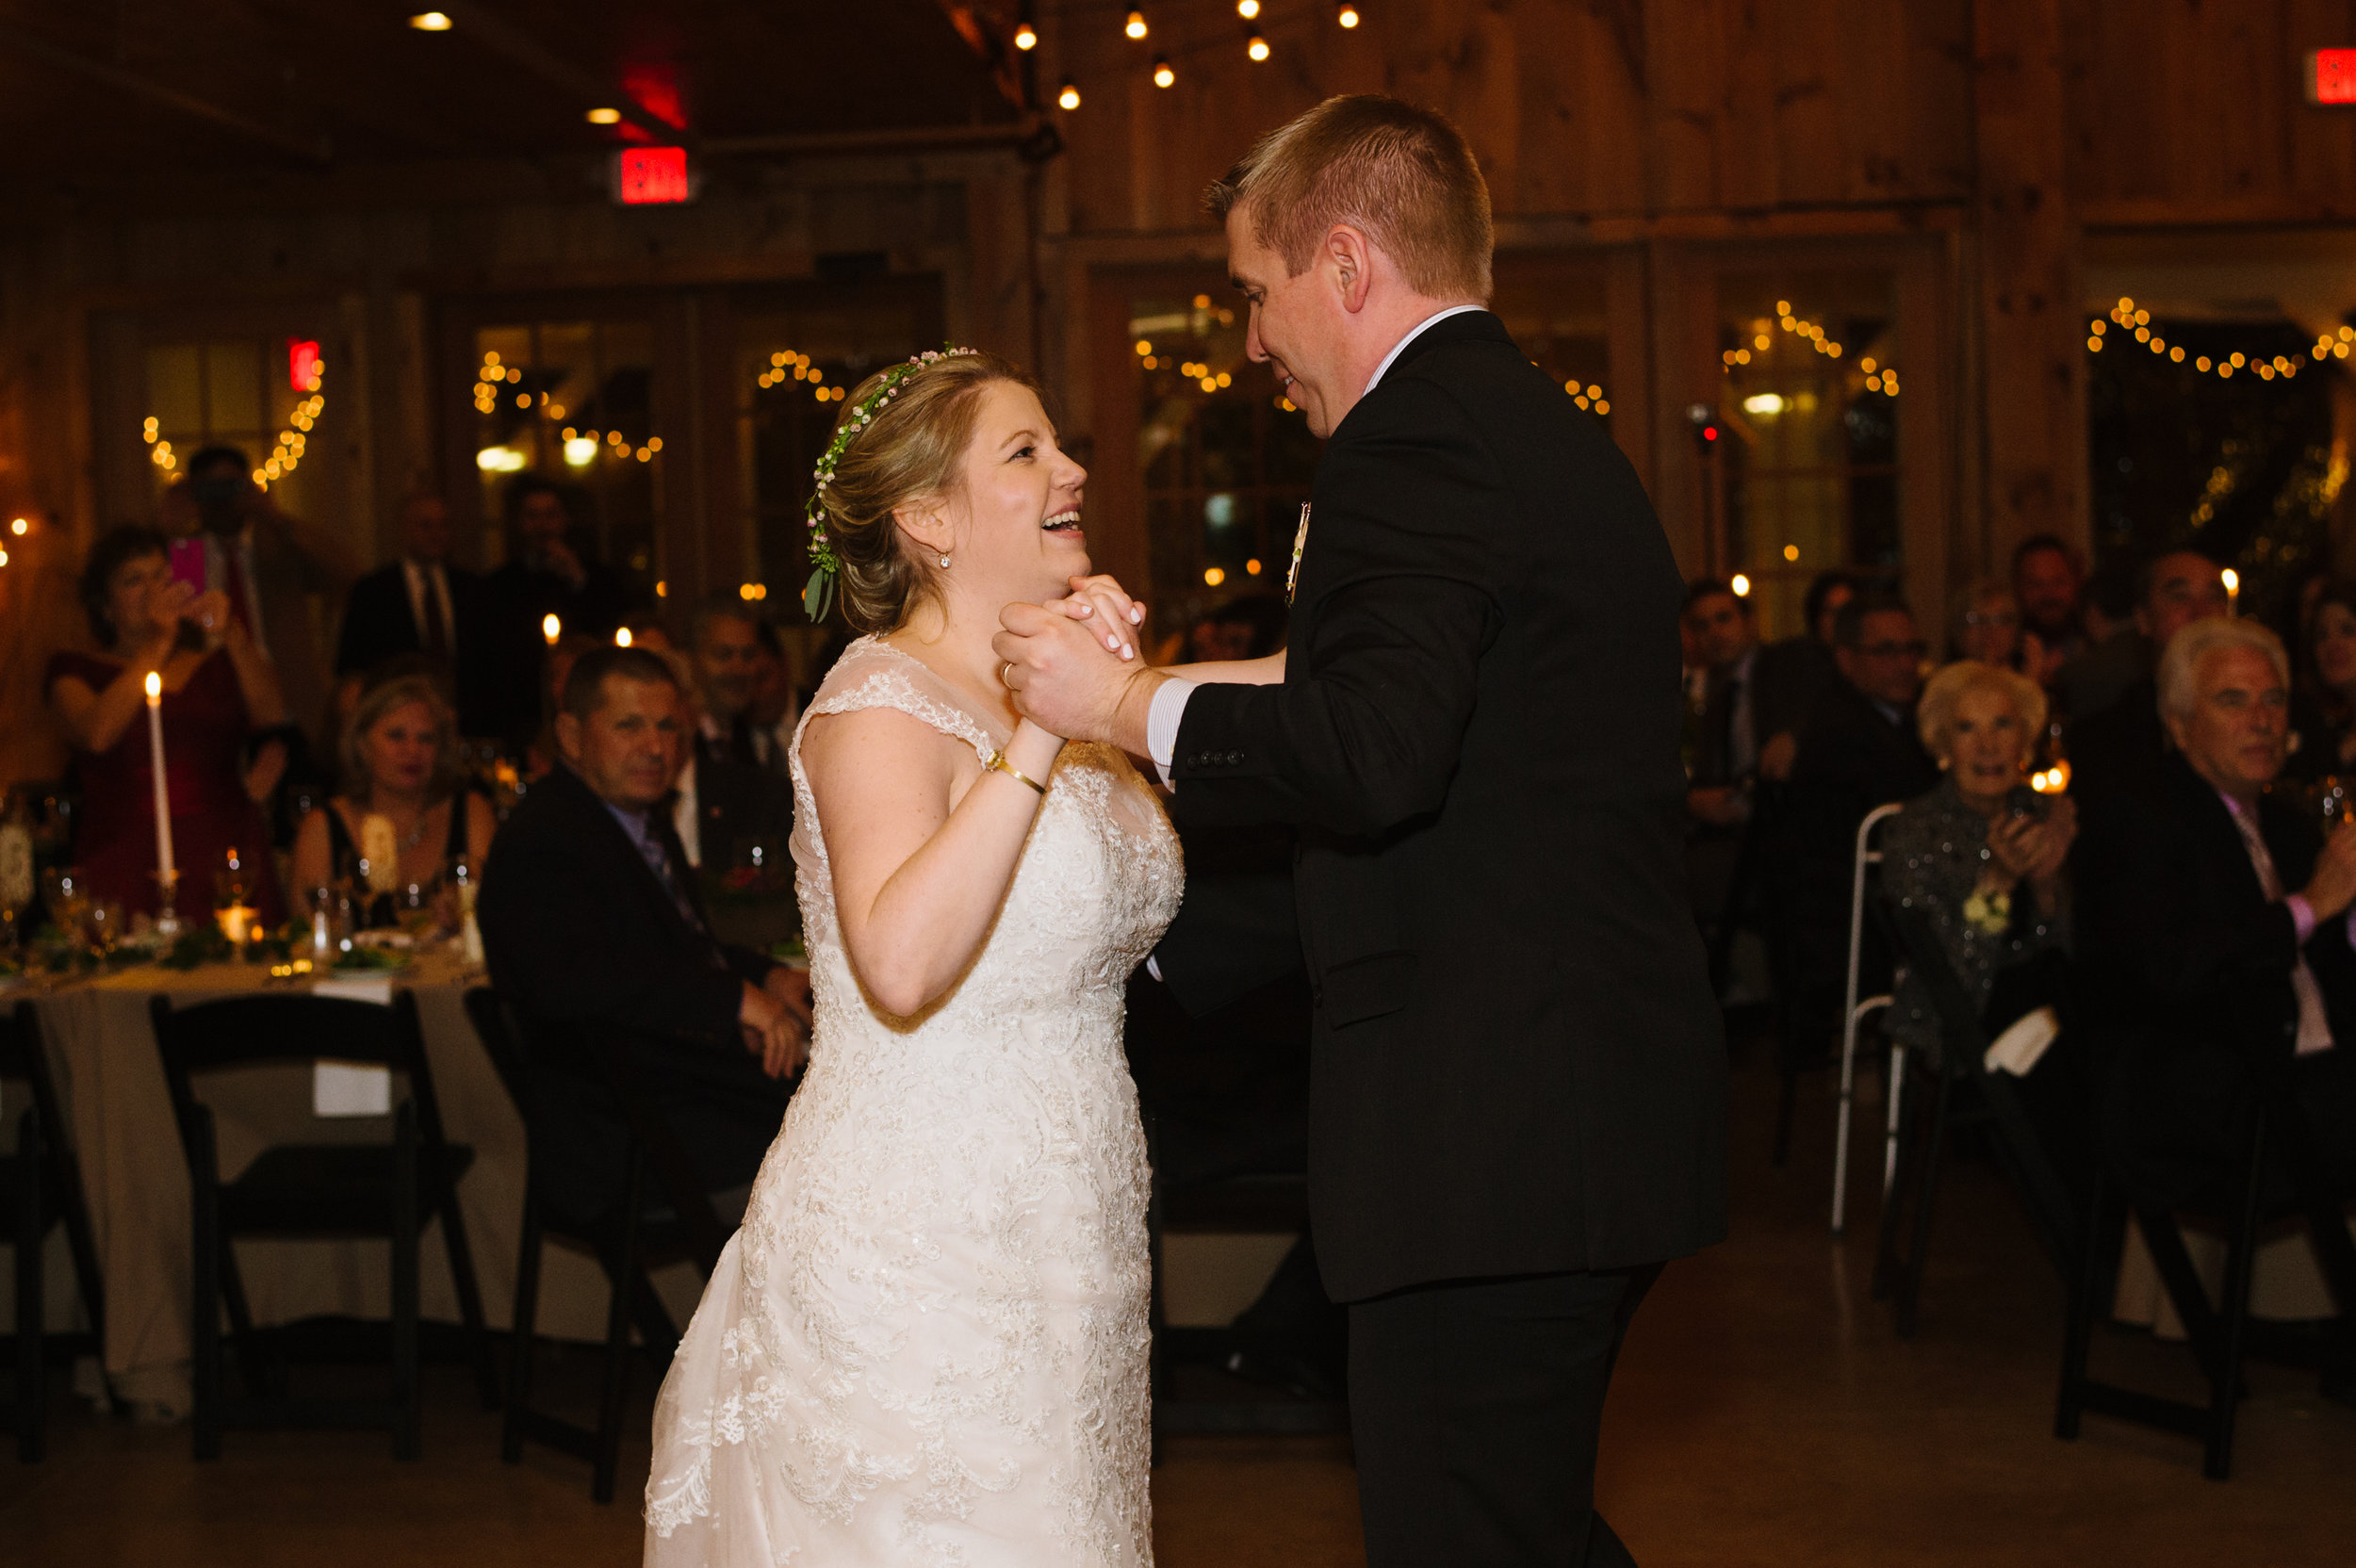 The-Inn-At-Manchester-Vermont-Wedding235.JPG